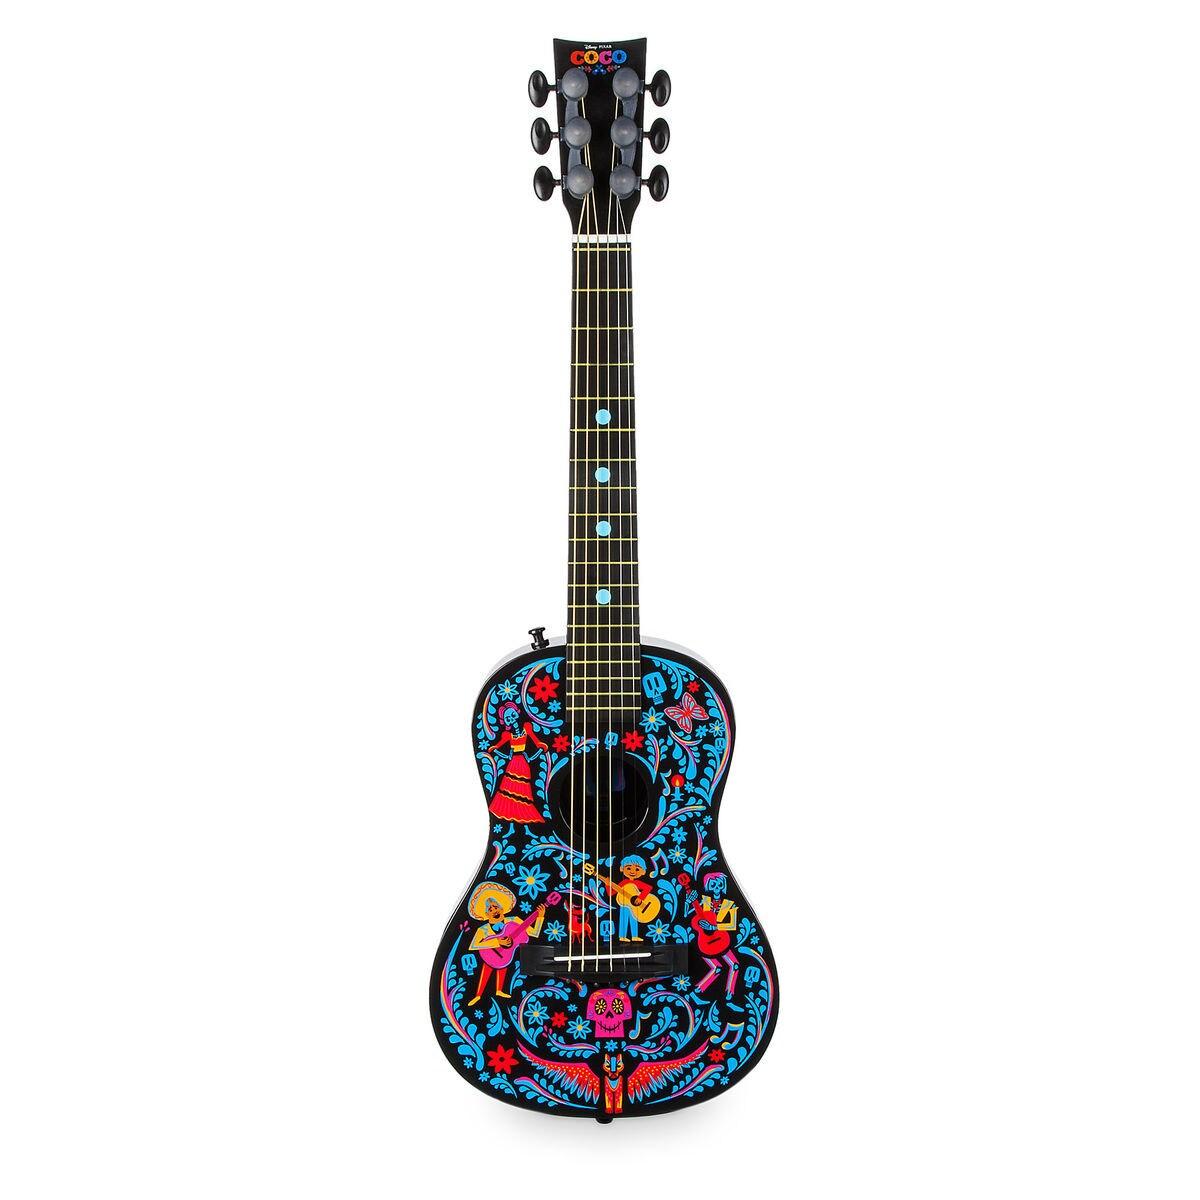 Coco Acoustic Guitar Shopdisney